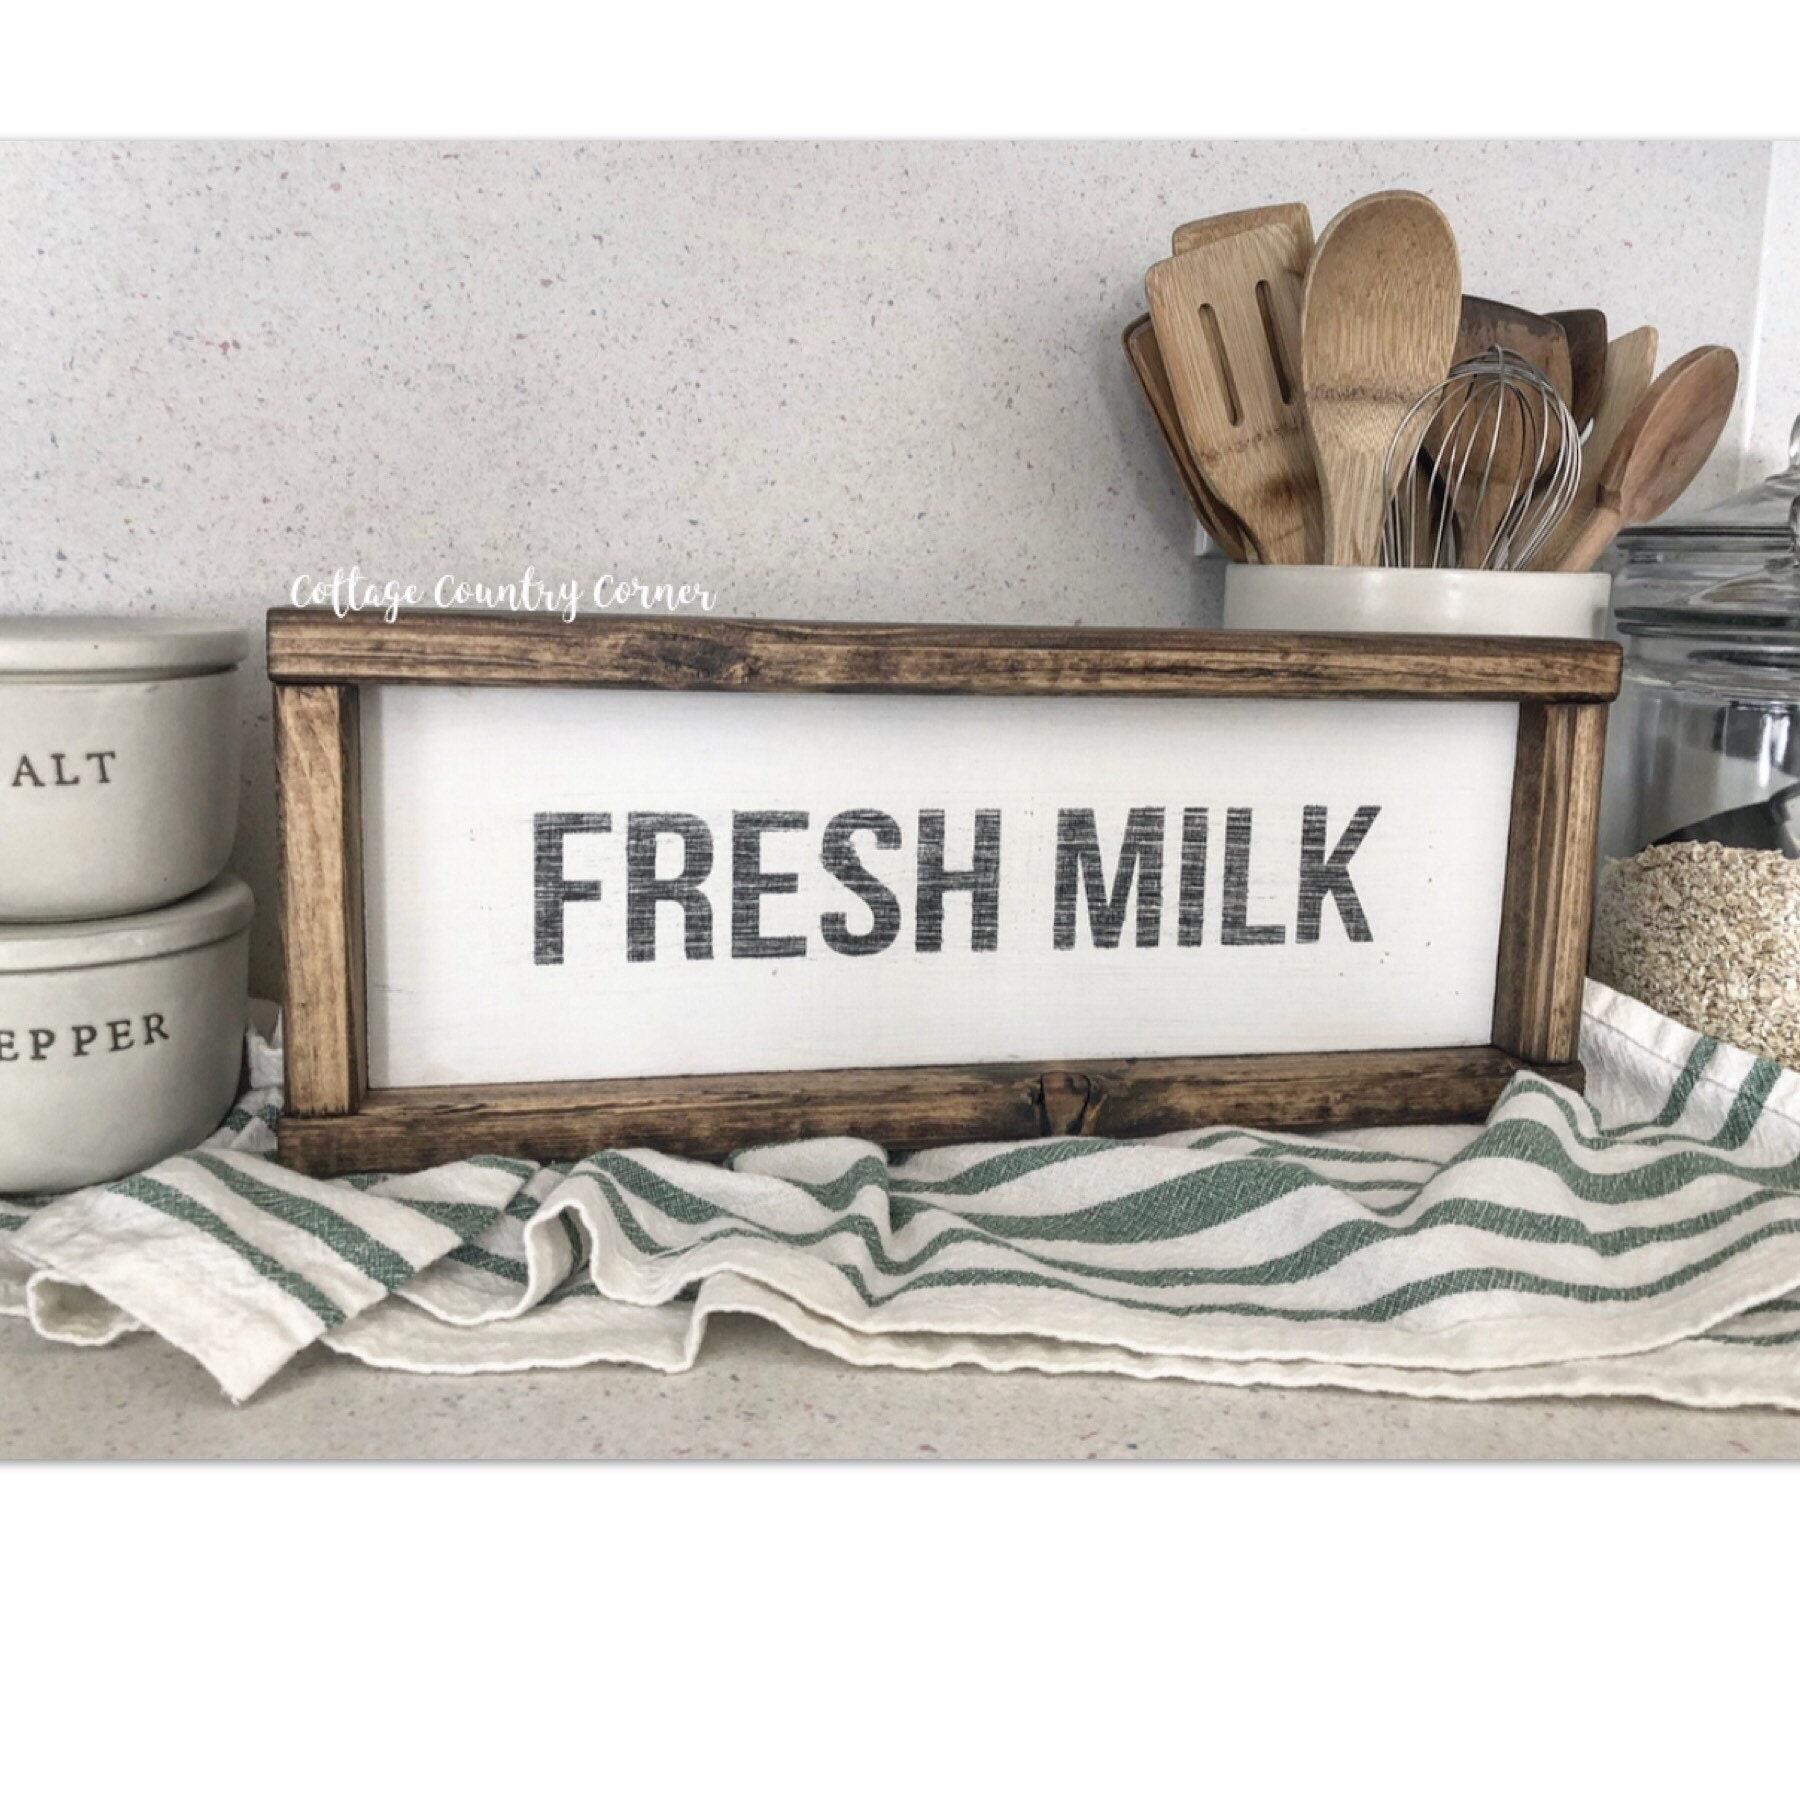 Fresh milk sign wood fresh milk sign farmhouse decor farmhouse kitchen farmhouse kitchen decor kitchen decor home decor